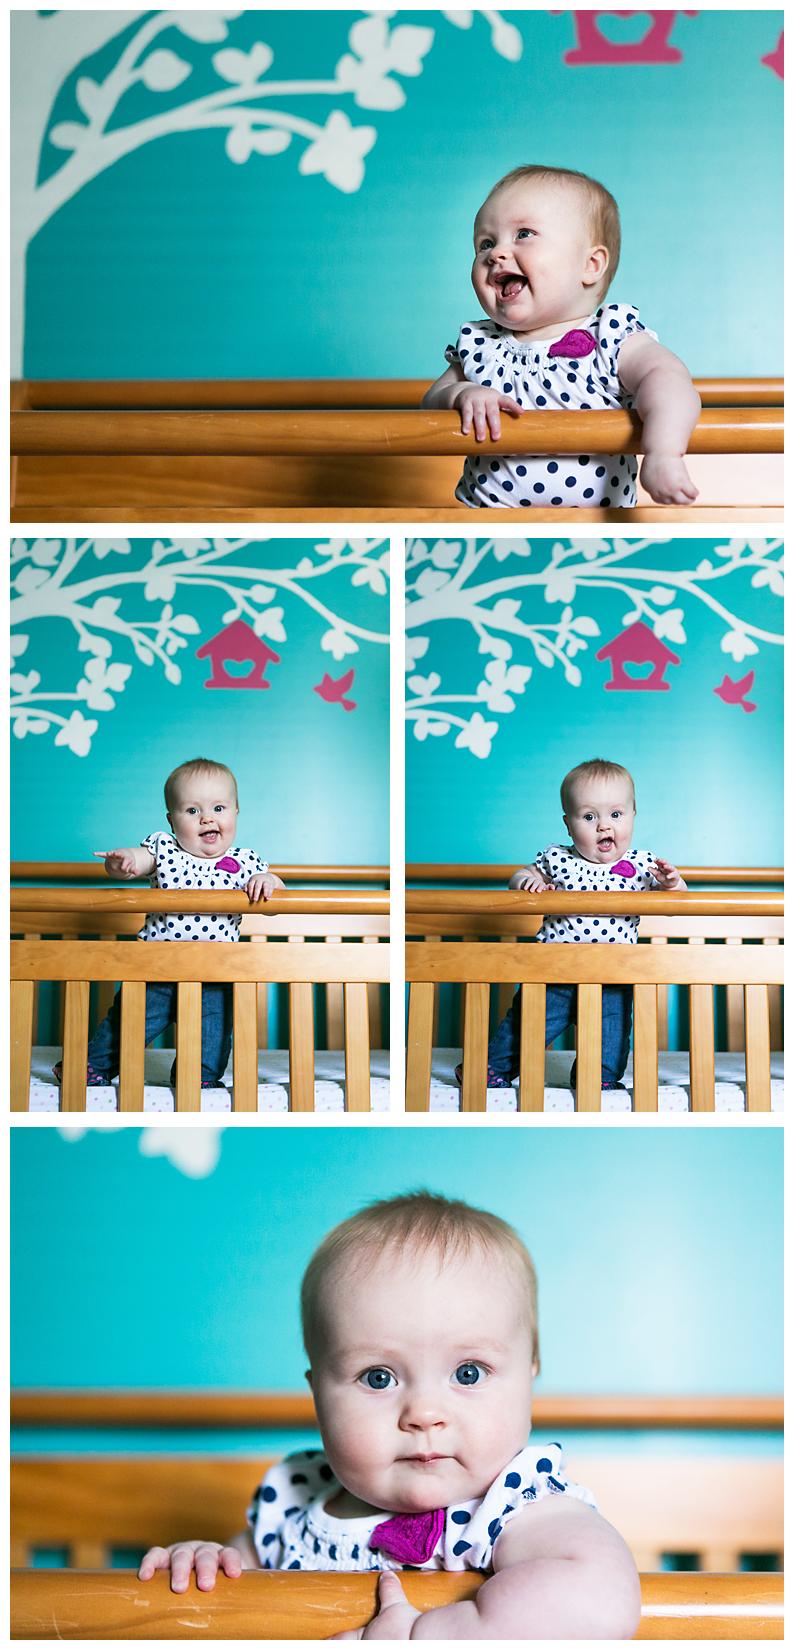 Blog-Collage-1373293975885